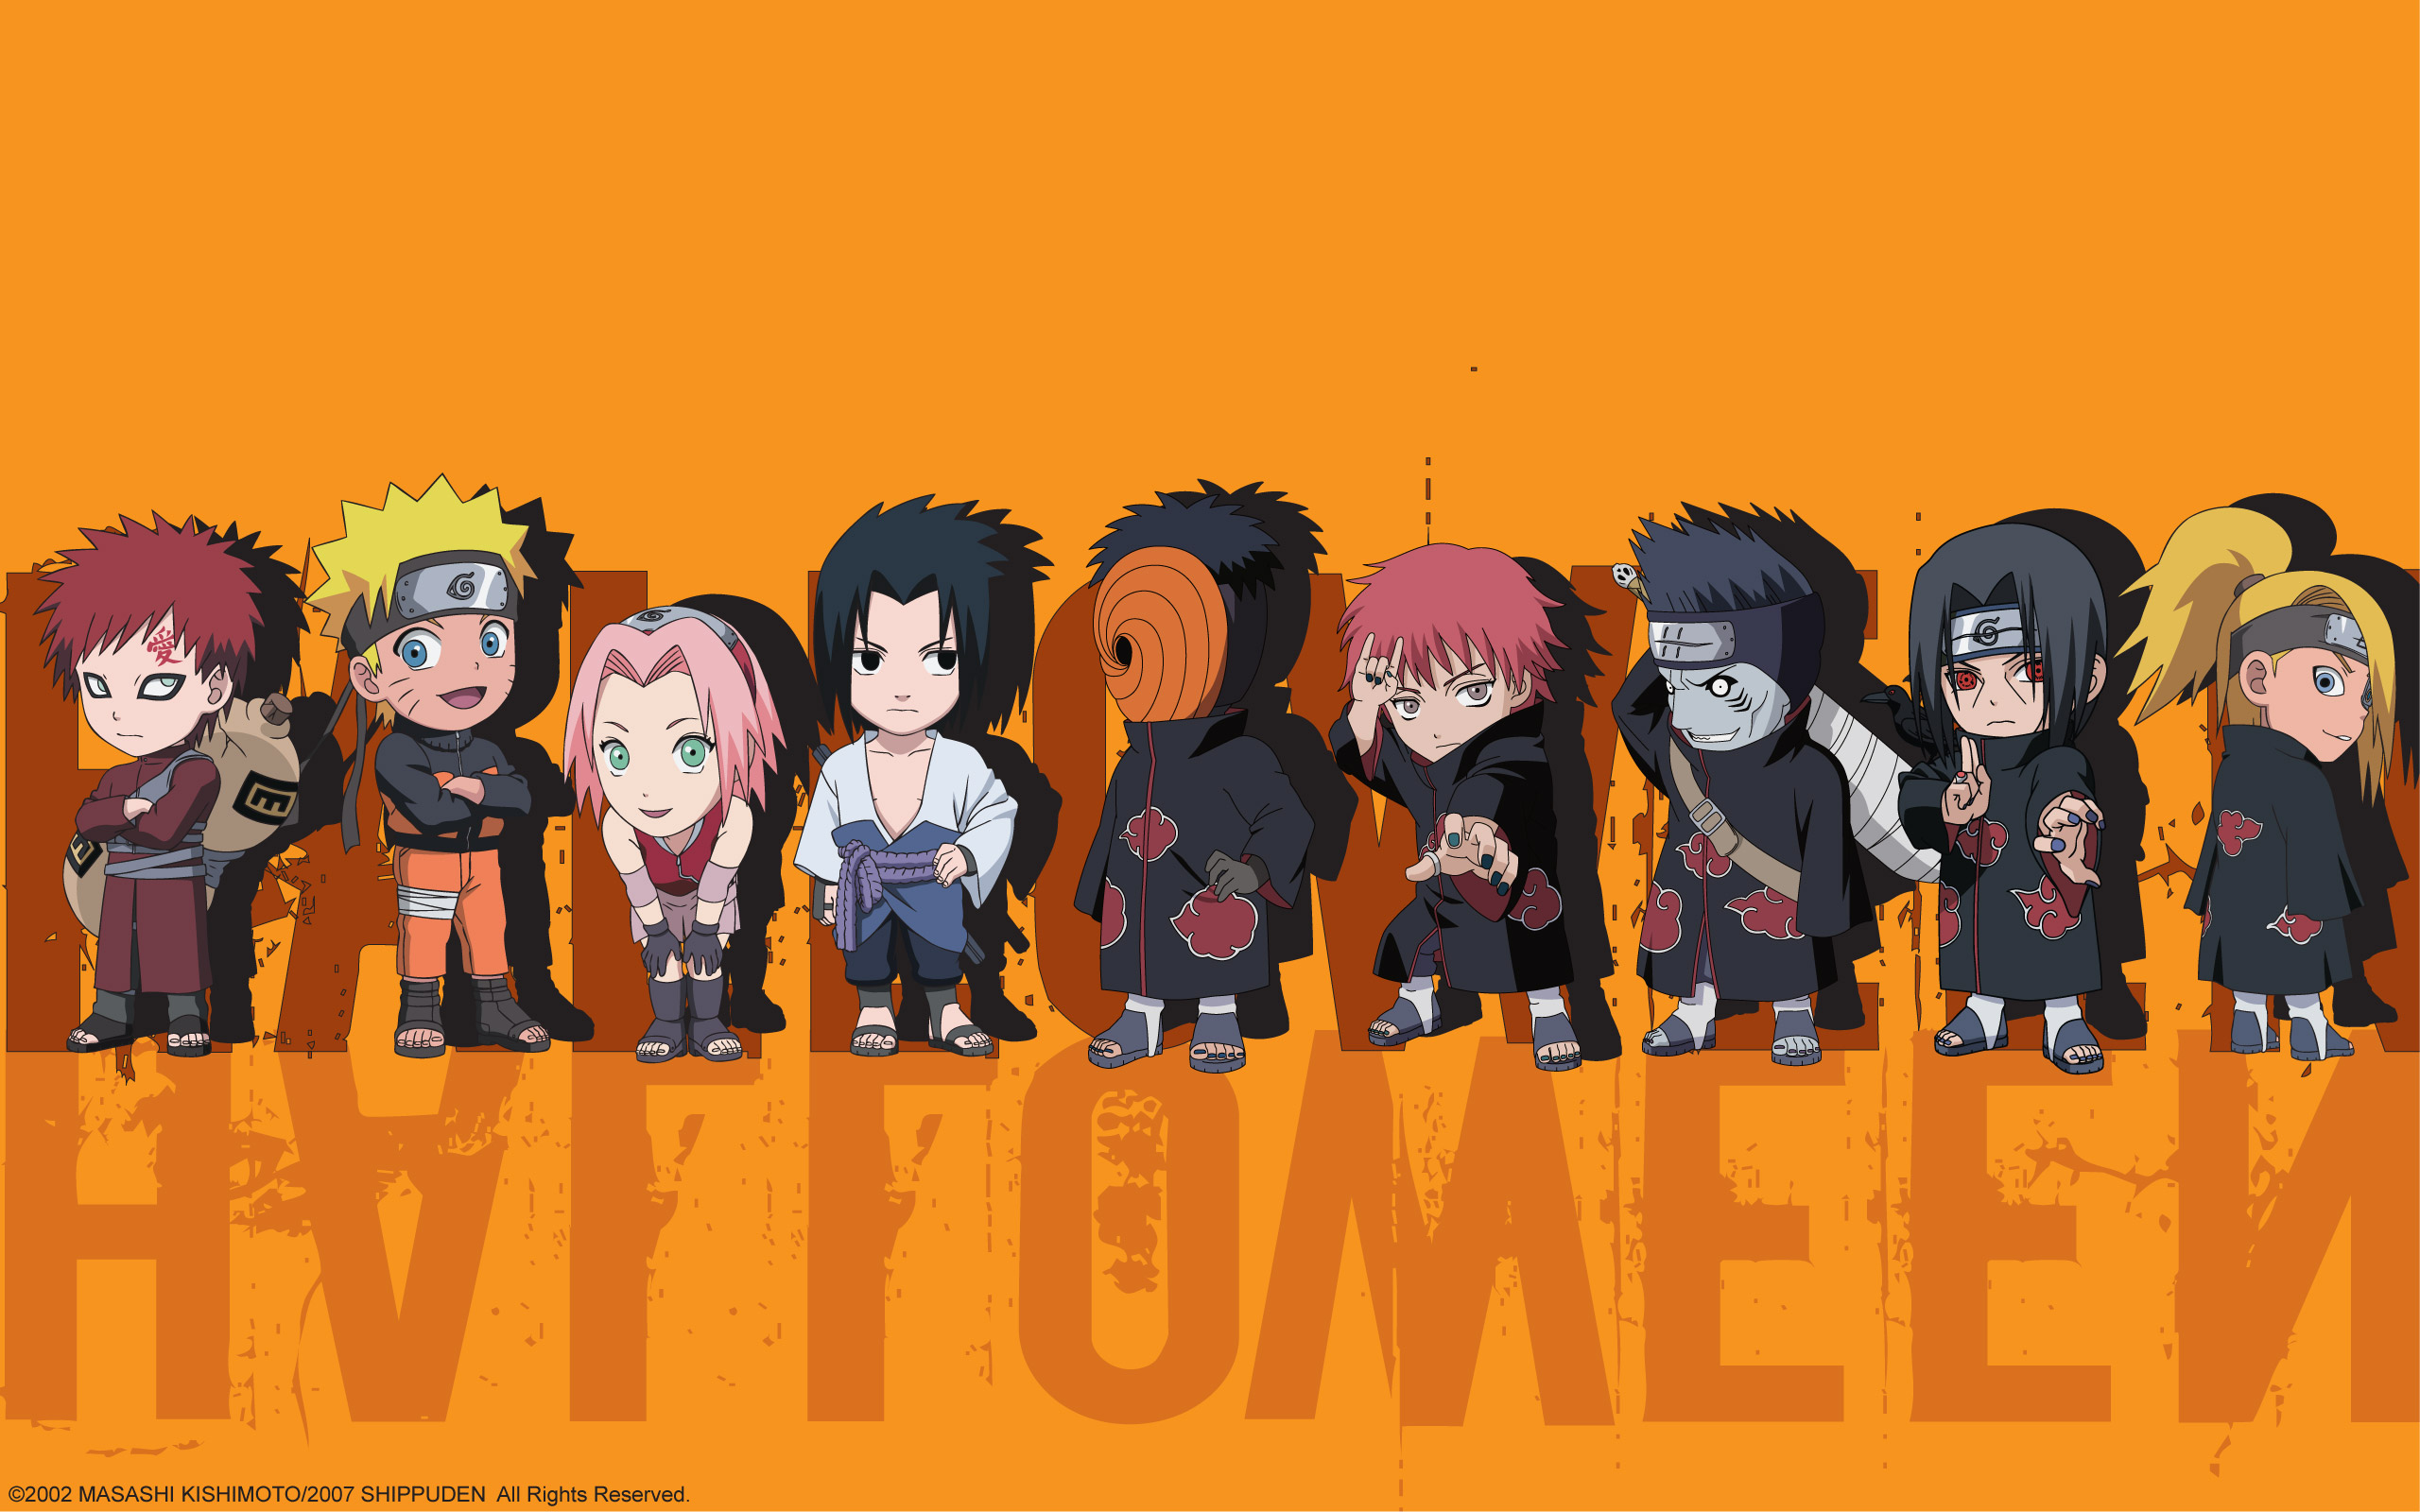 Naruto Shippuden Chibis   Uchiha Obito Wallpaper 32267008 2560x1600